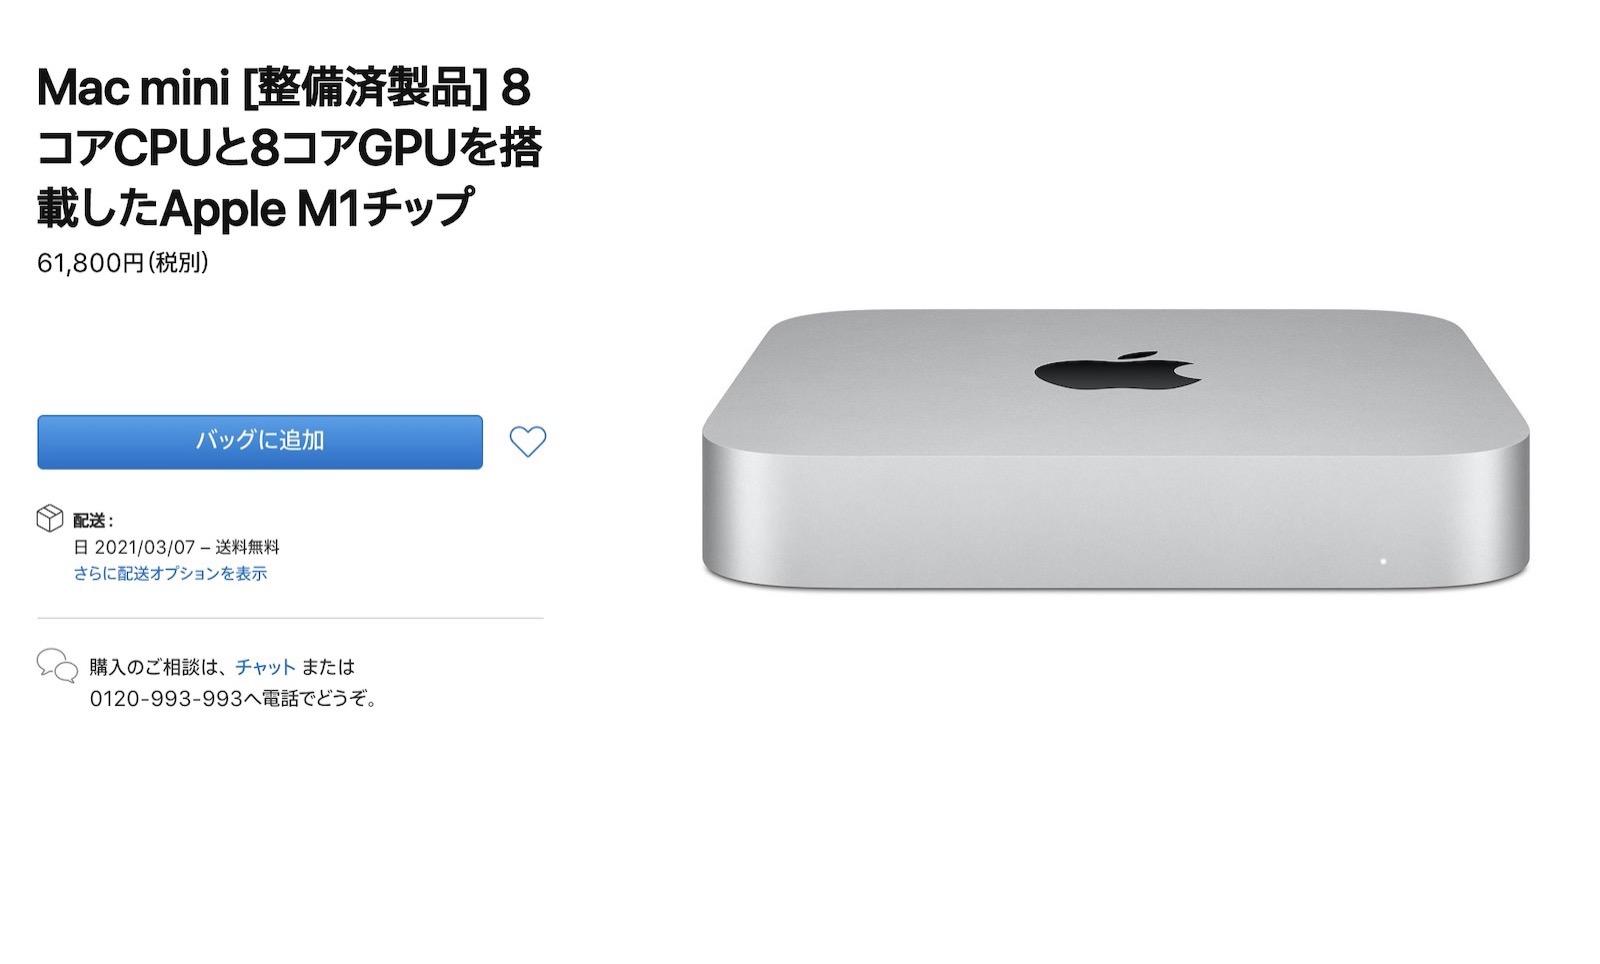 M1 mac mini refurbished